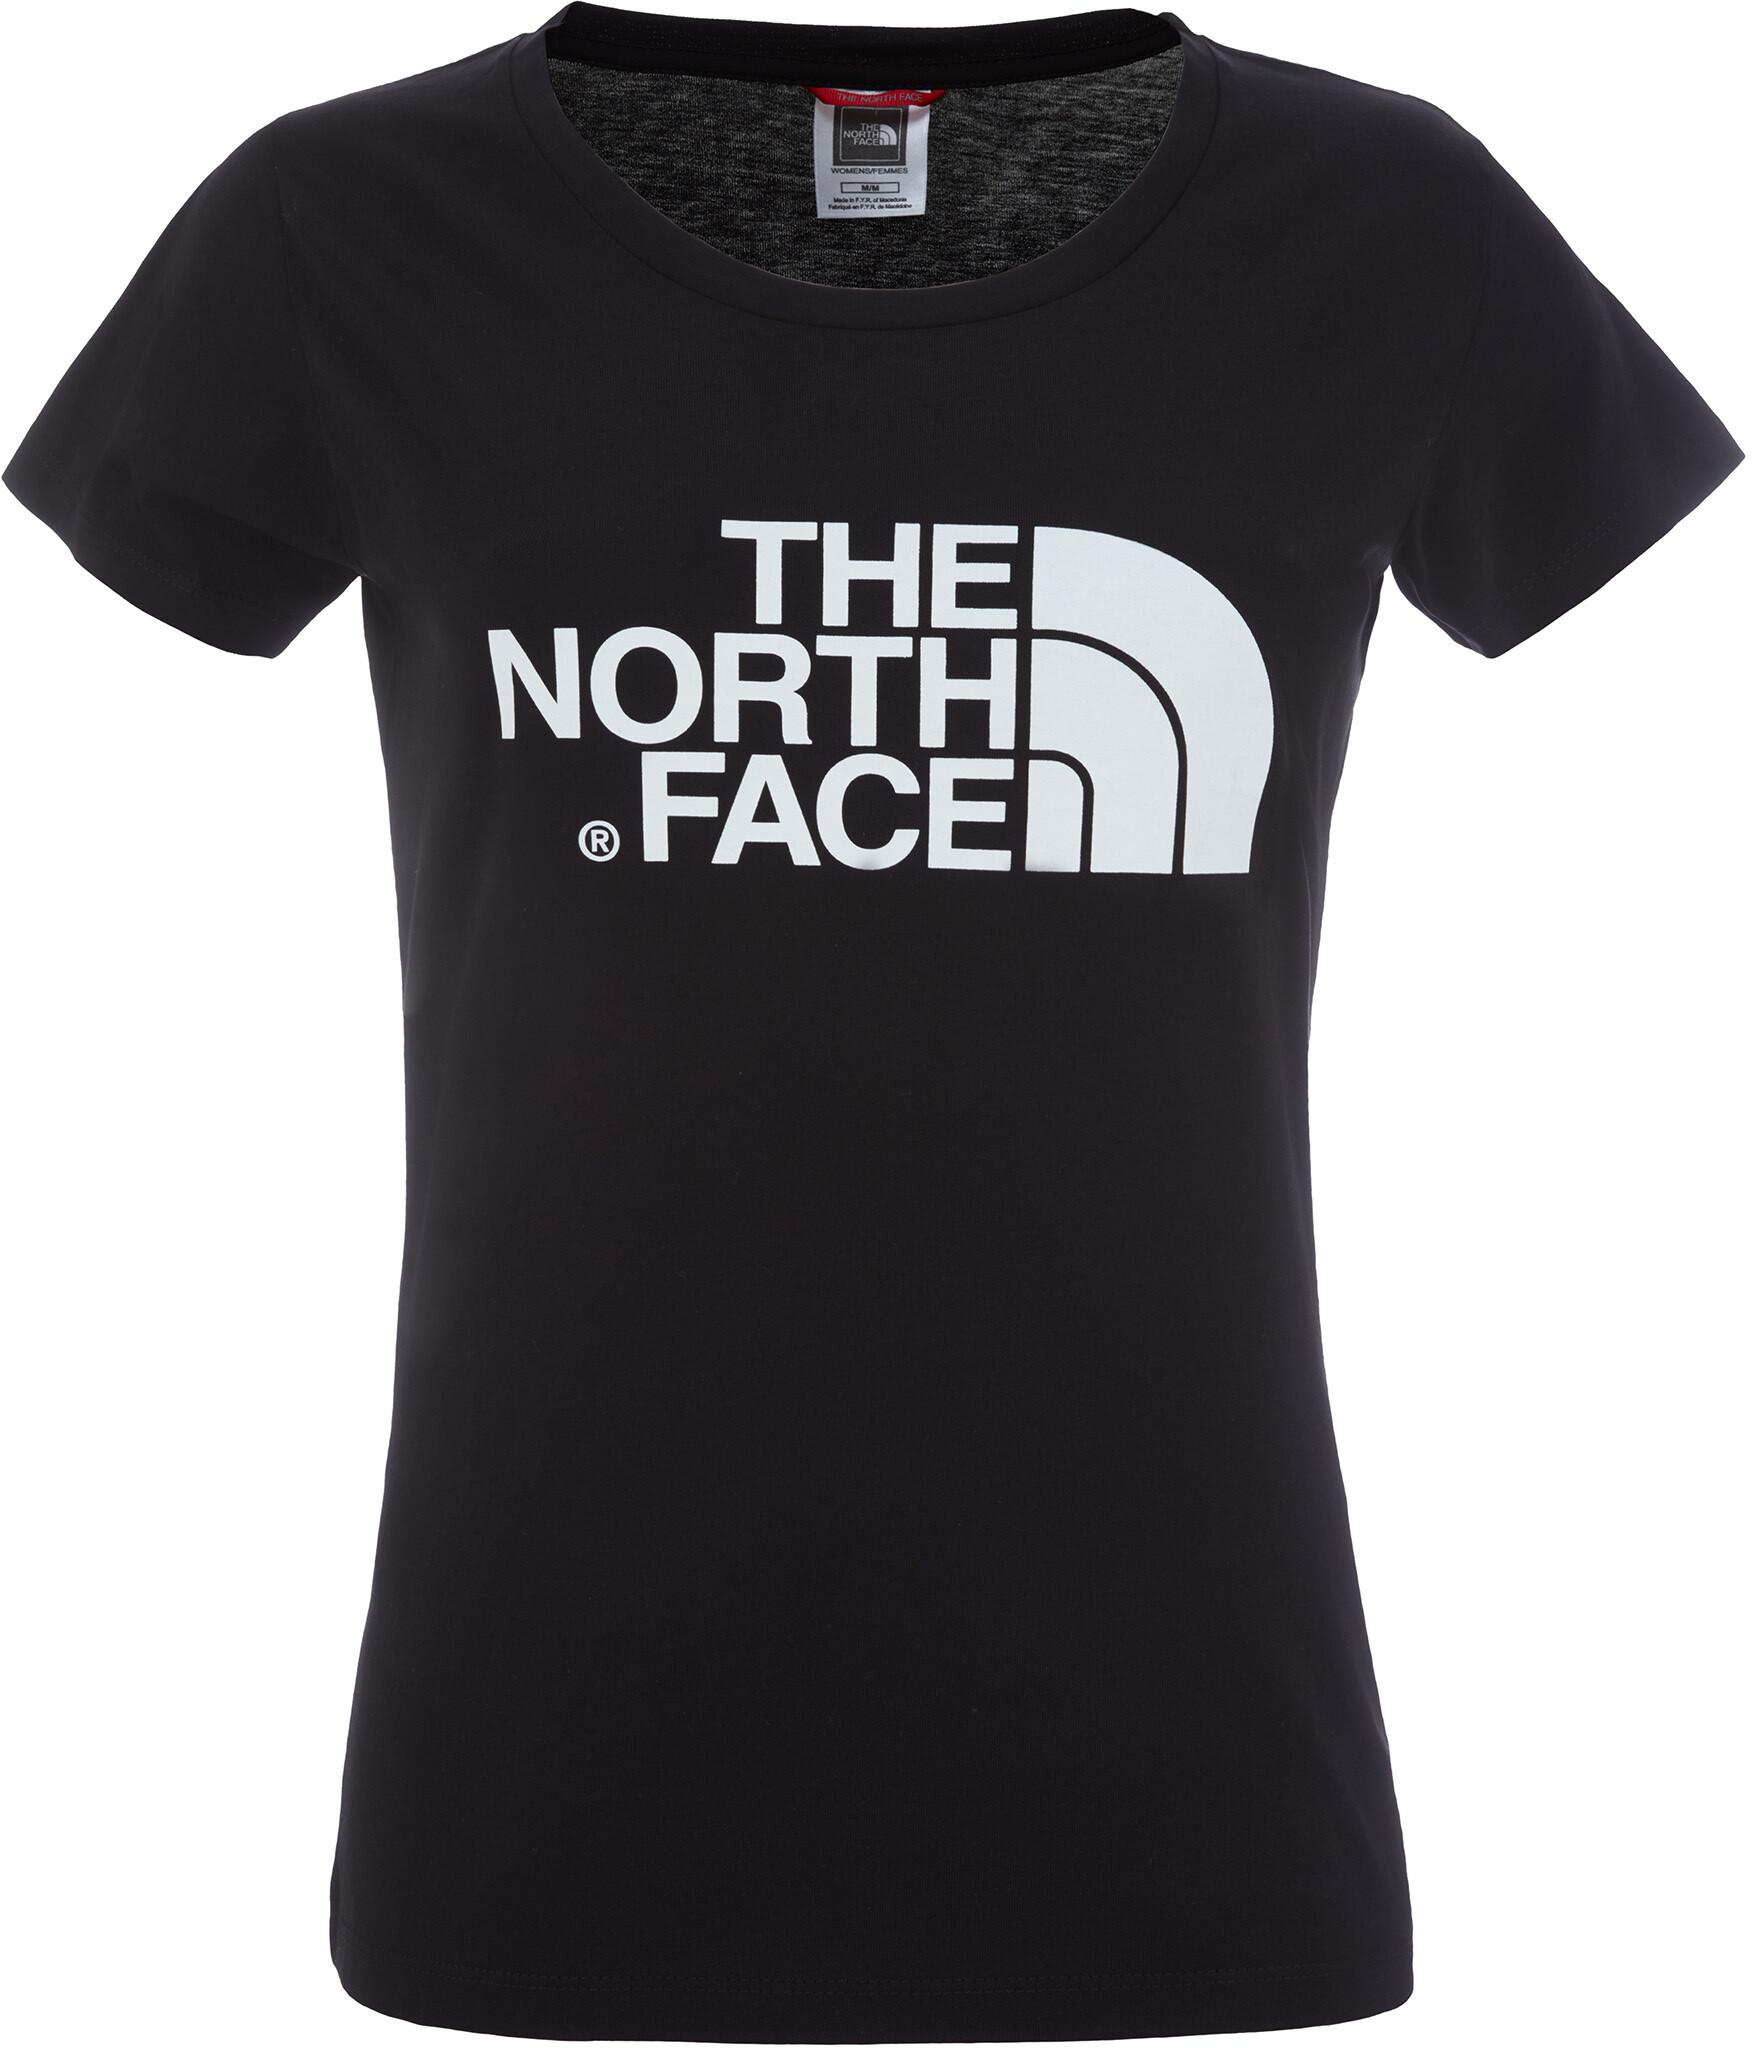 The North Face Easy Naiset Lyhythihainen paita  5a3d03250b